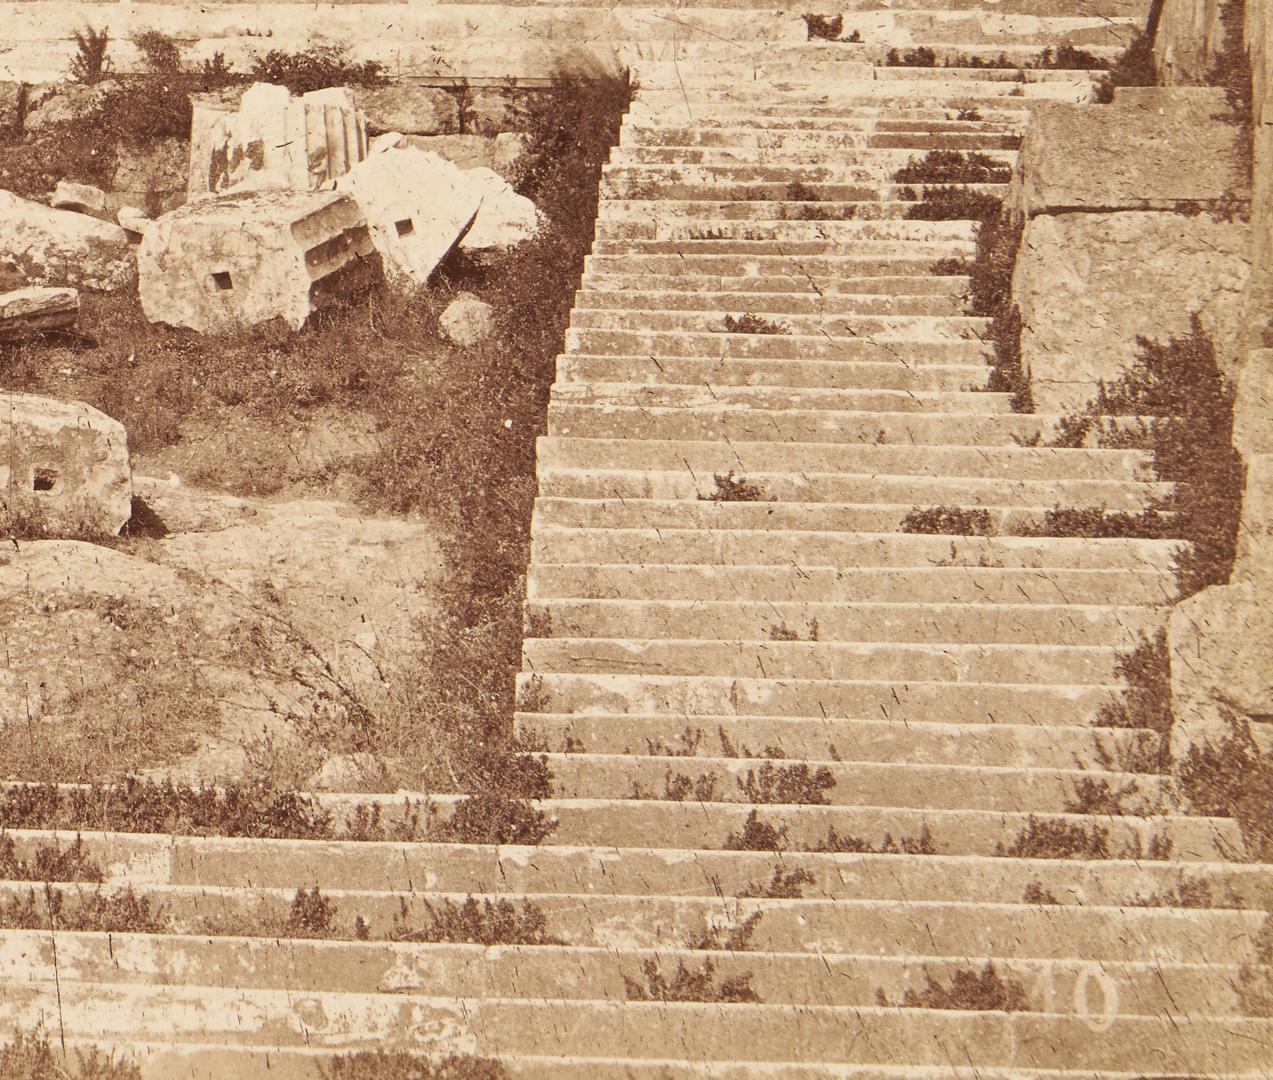 Lot 1070: 2 Early Views of Greece, attr. Dimitrios Constantin